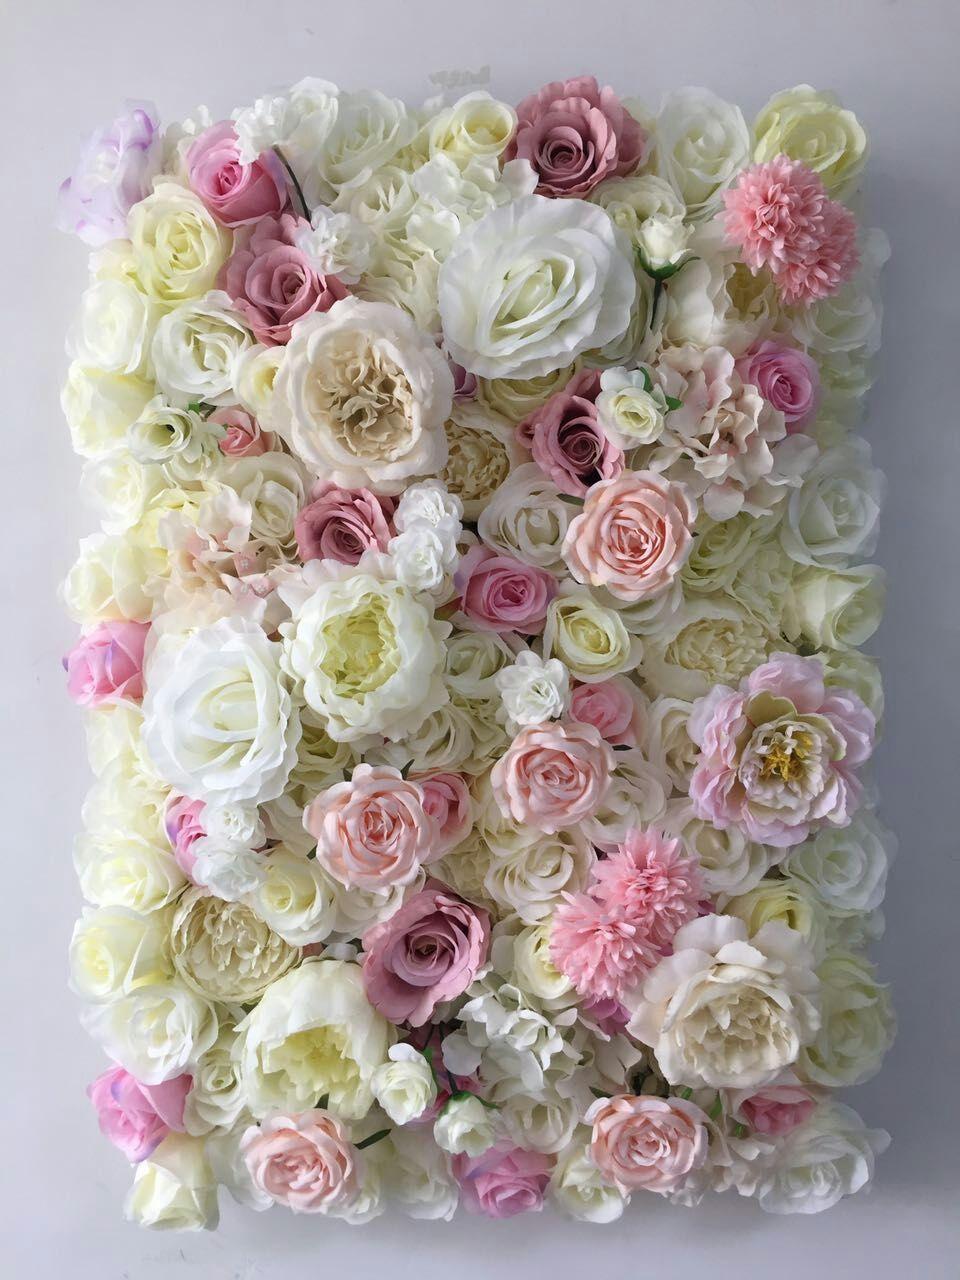 Giga Spring Flower Wall Dahlia Hydrangea Peony Rose Little Rose Little Accessories Flower Flower Wall Wedding Spring Flowers Flower Wall